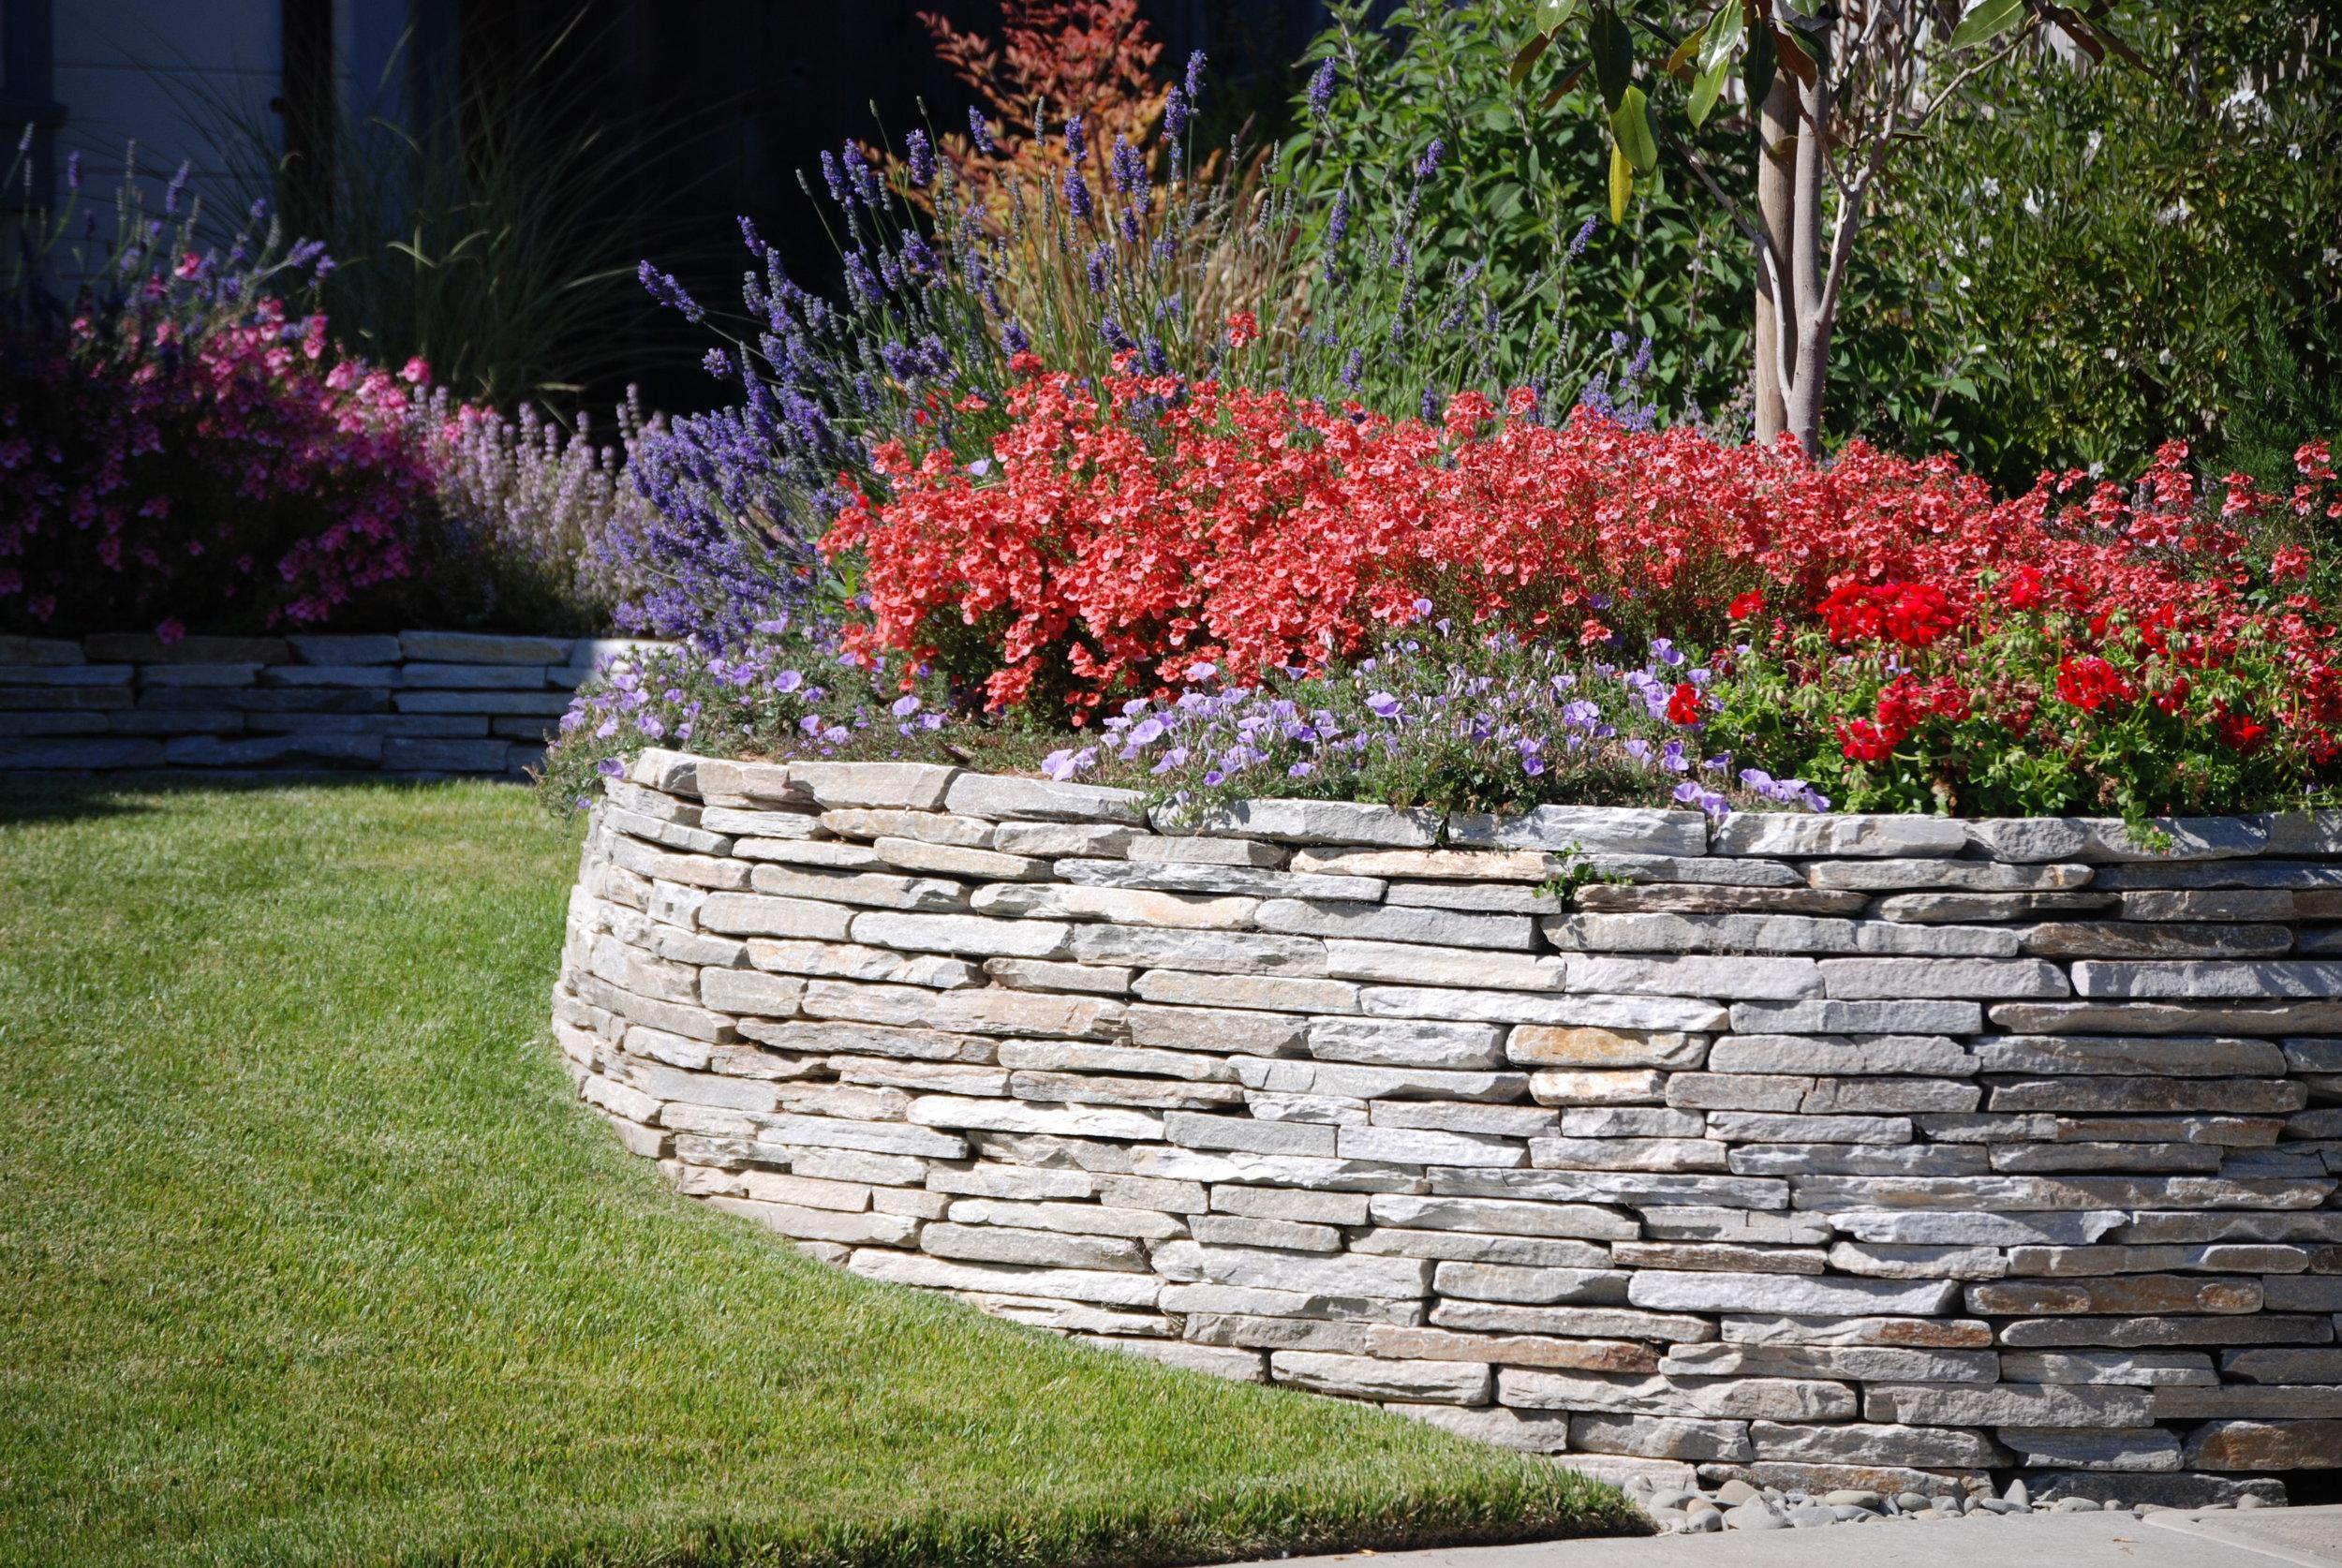 Decorative Stone Wall.JPG